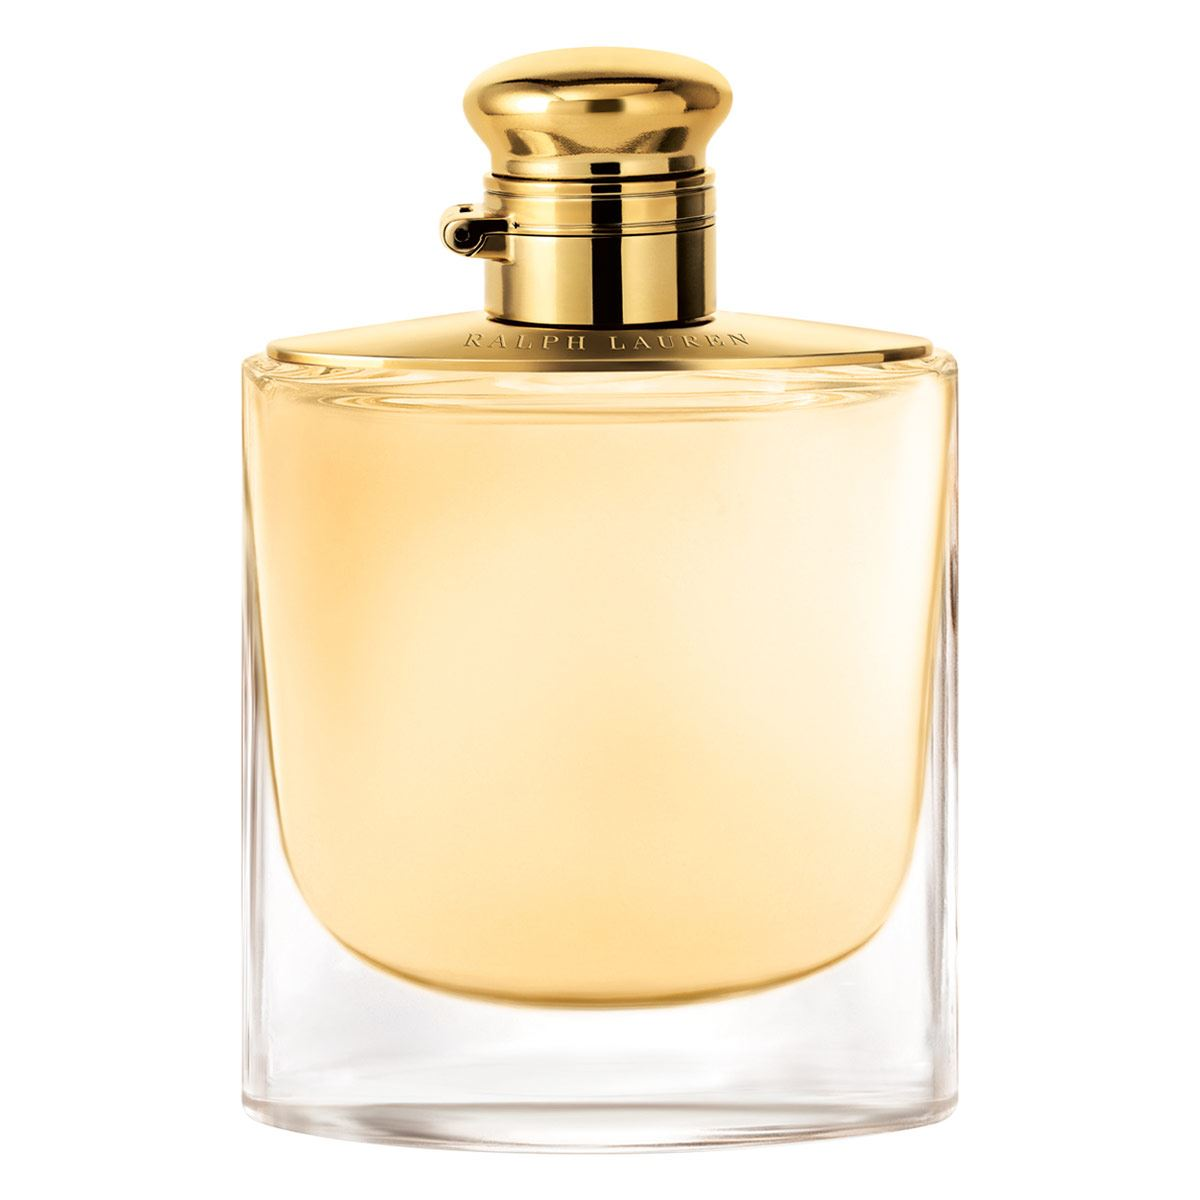 Fragancia Para Dama Woman Ralph Lauren 110 ml